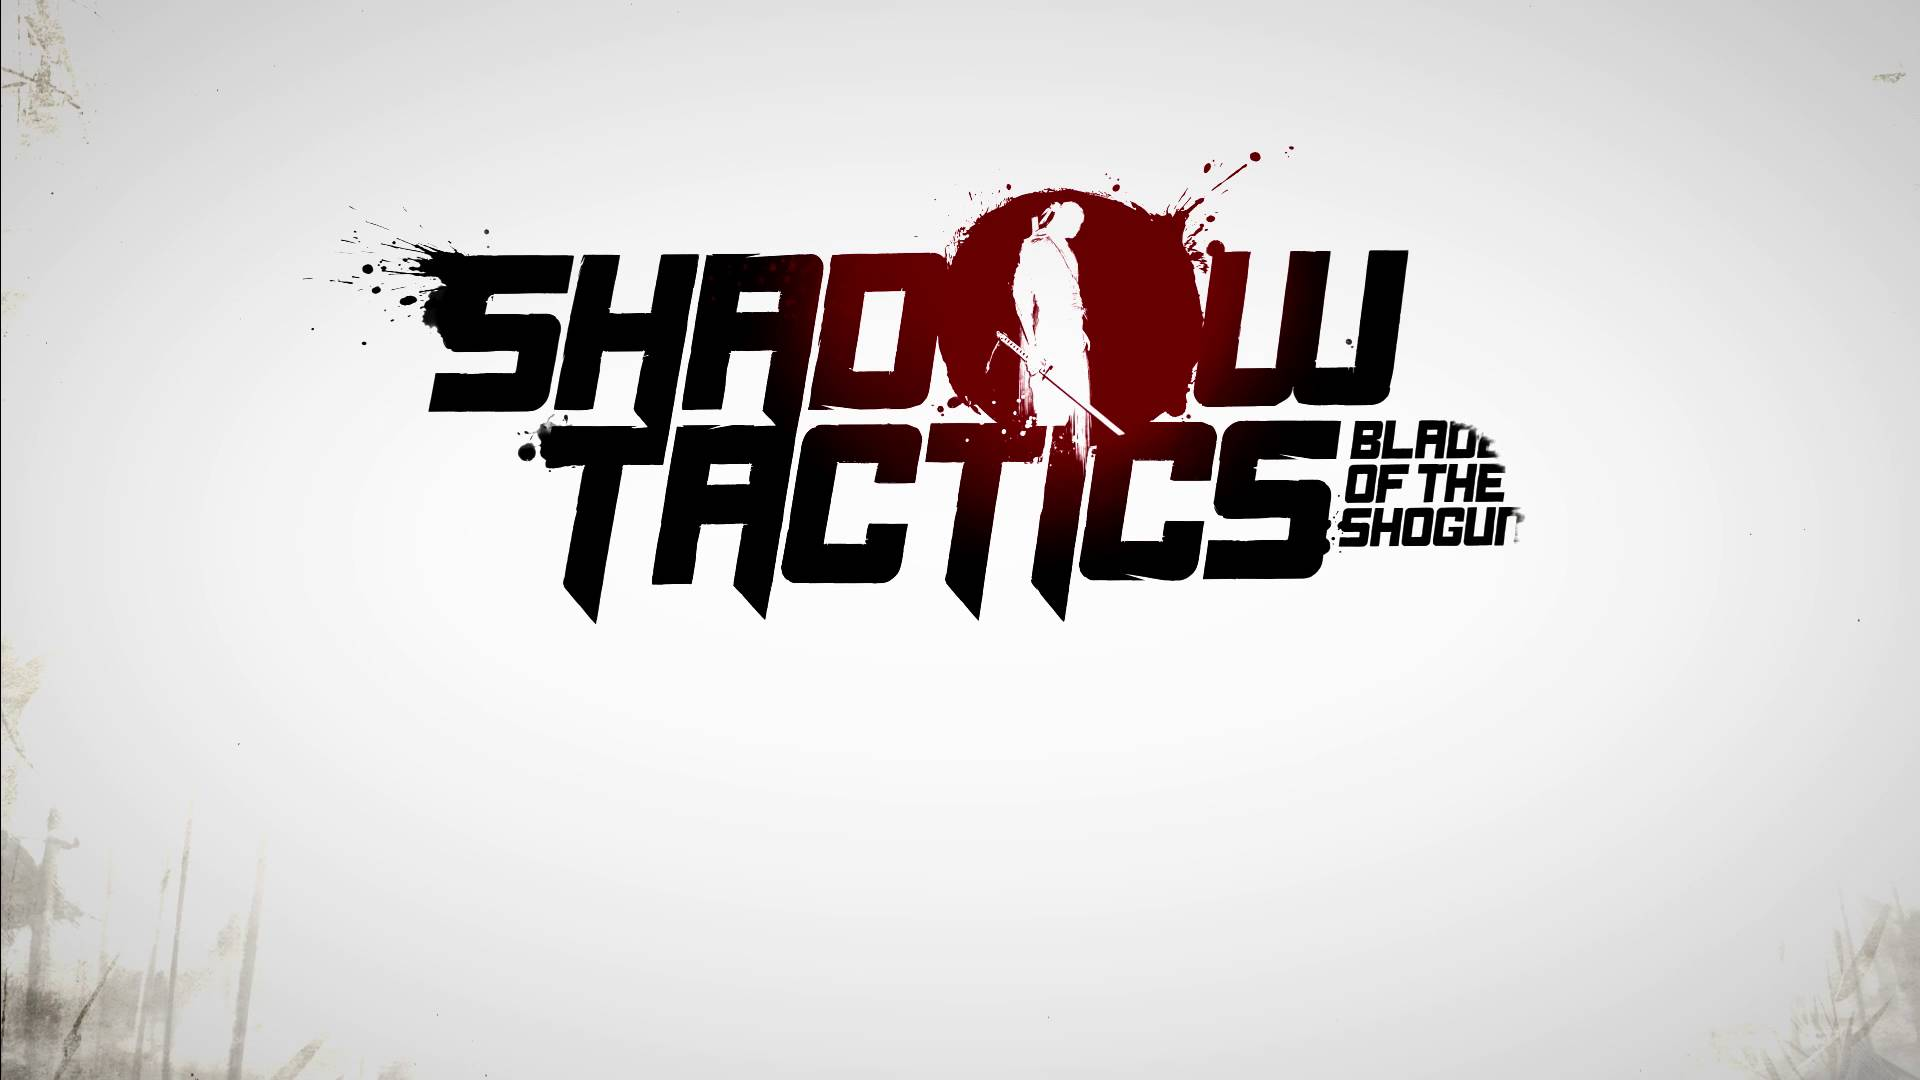 Shadow Tactics: Blades of the Shogun telecharger gratuit de PC et Torrent